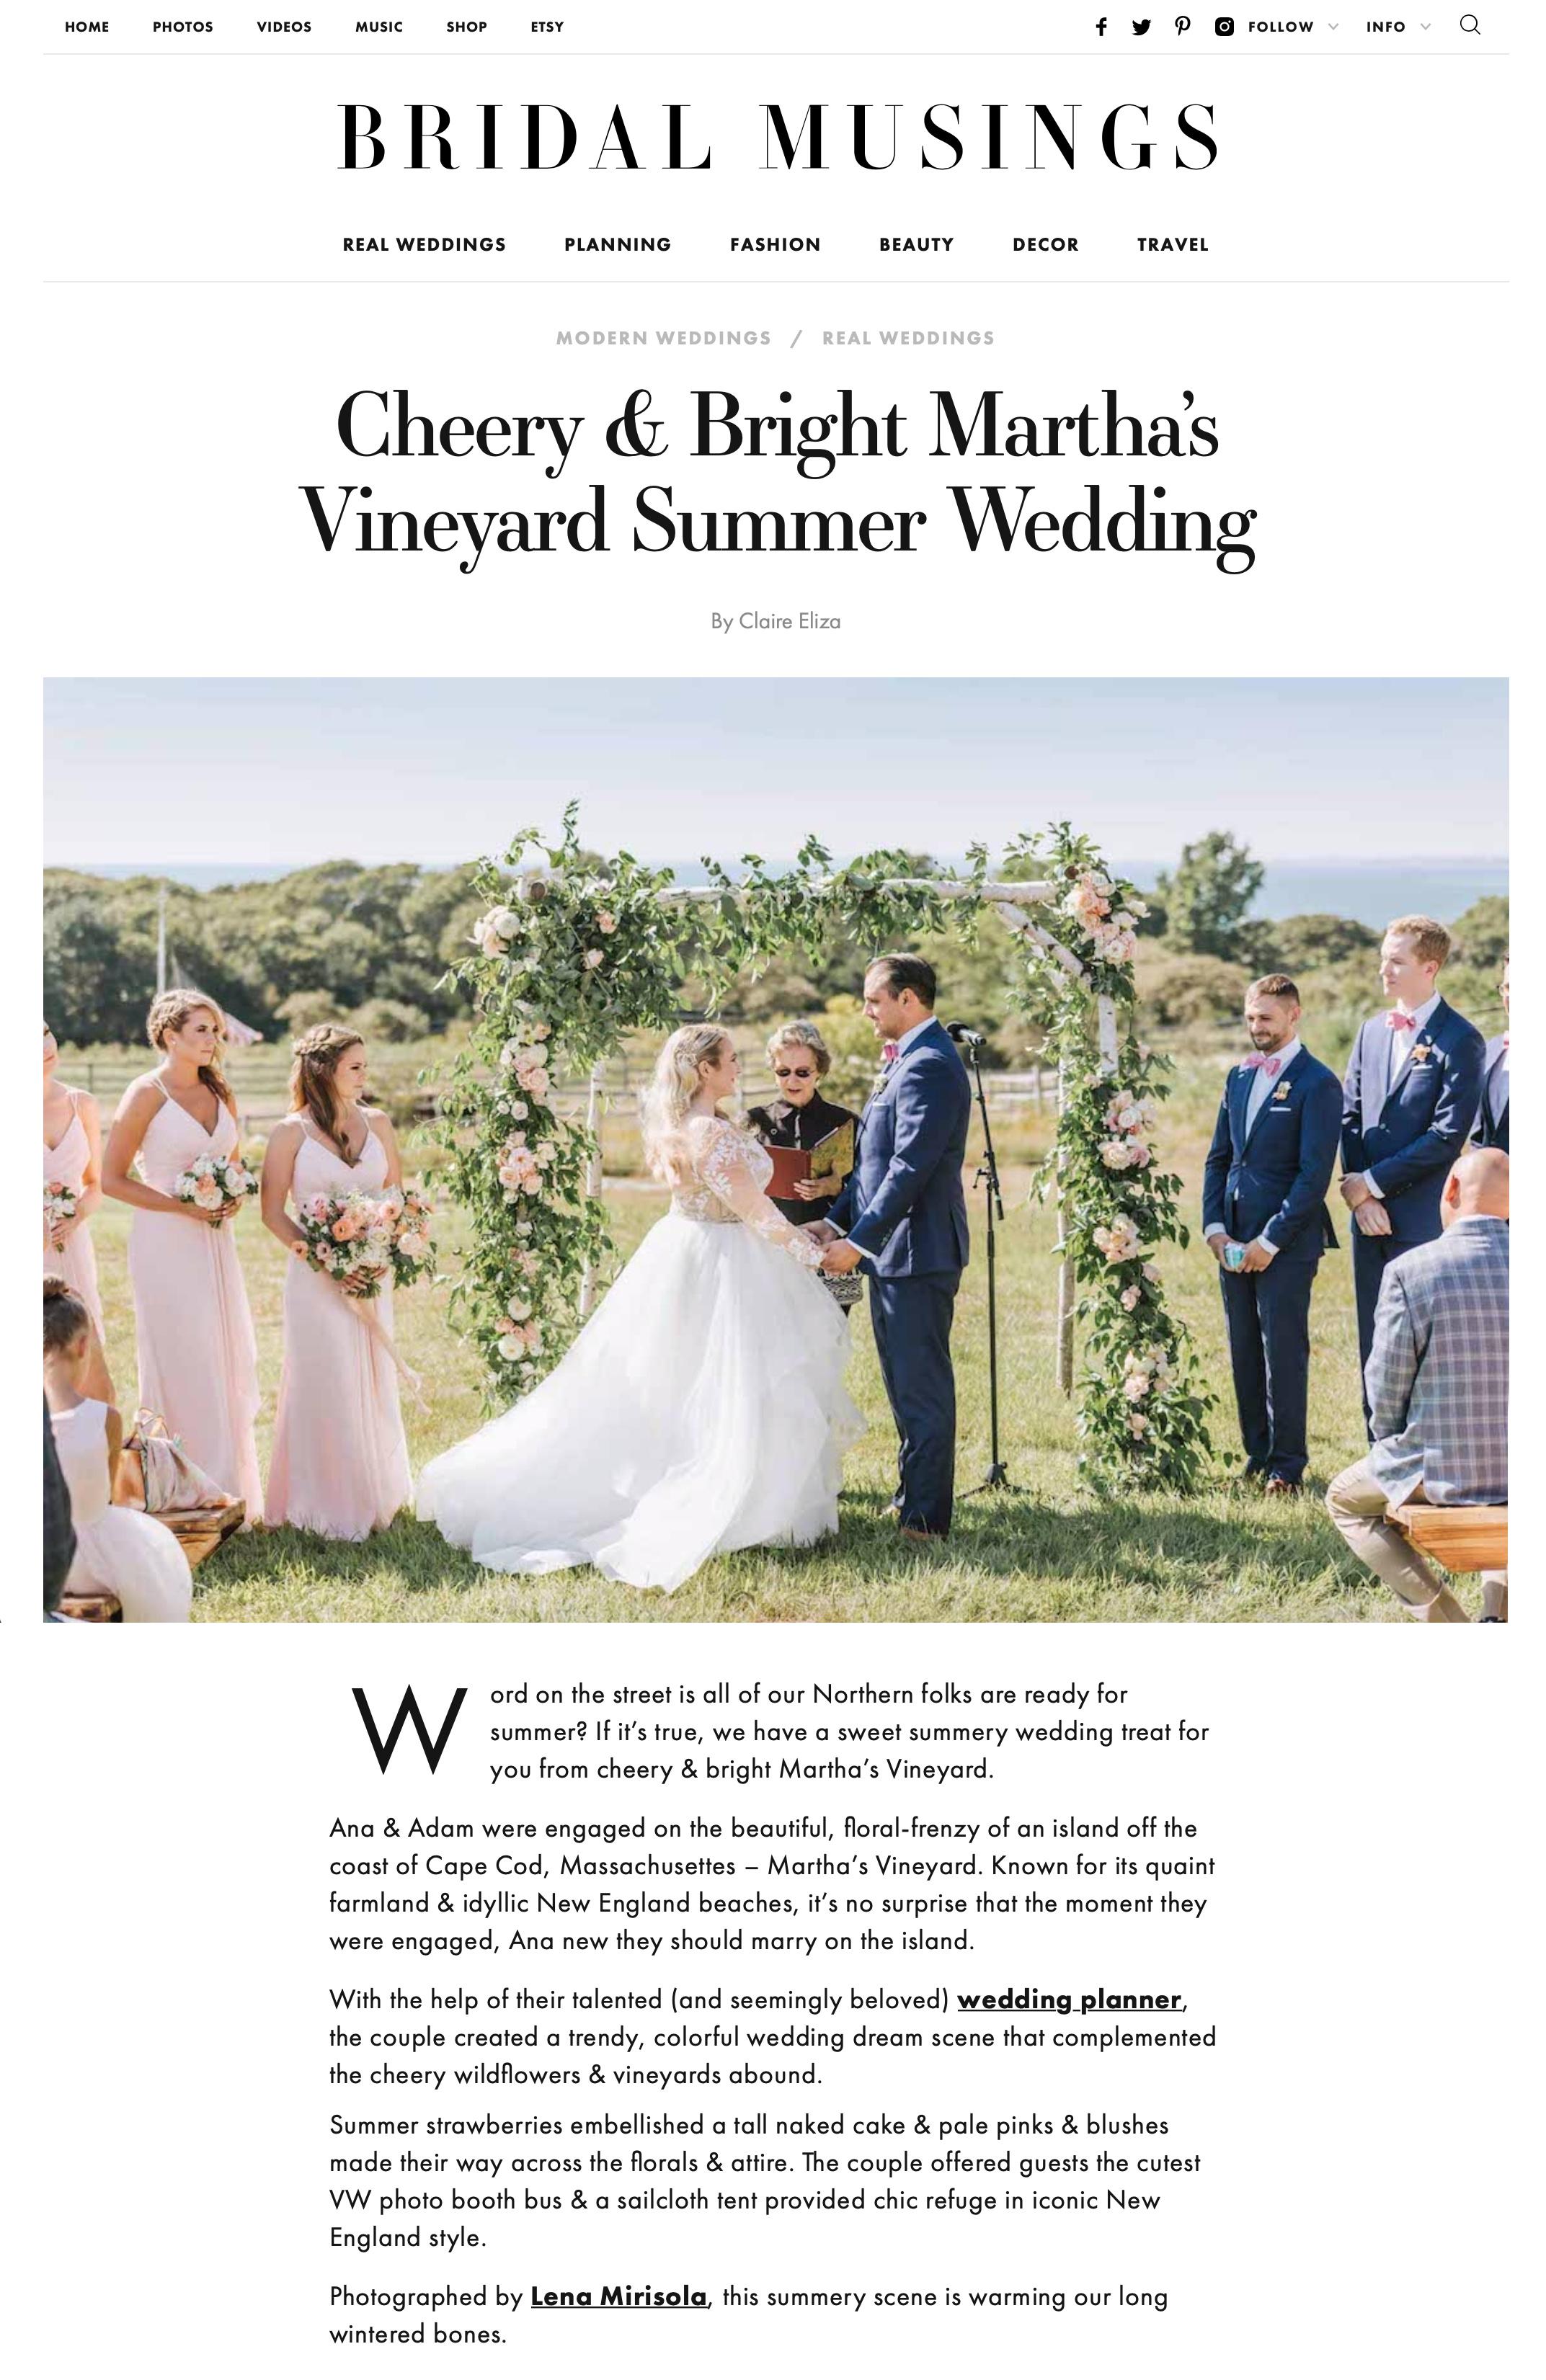 Bridal Musings Marthas Vineyard Lena Mirisola published.png.jpg